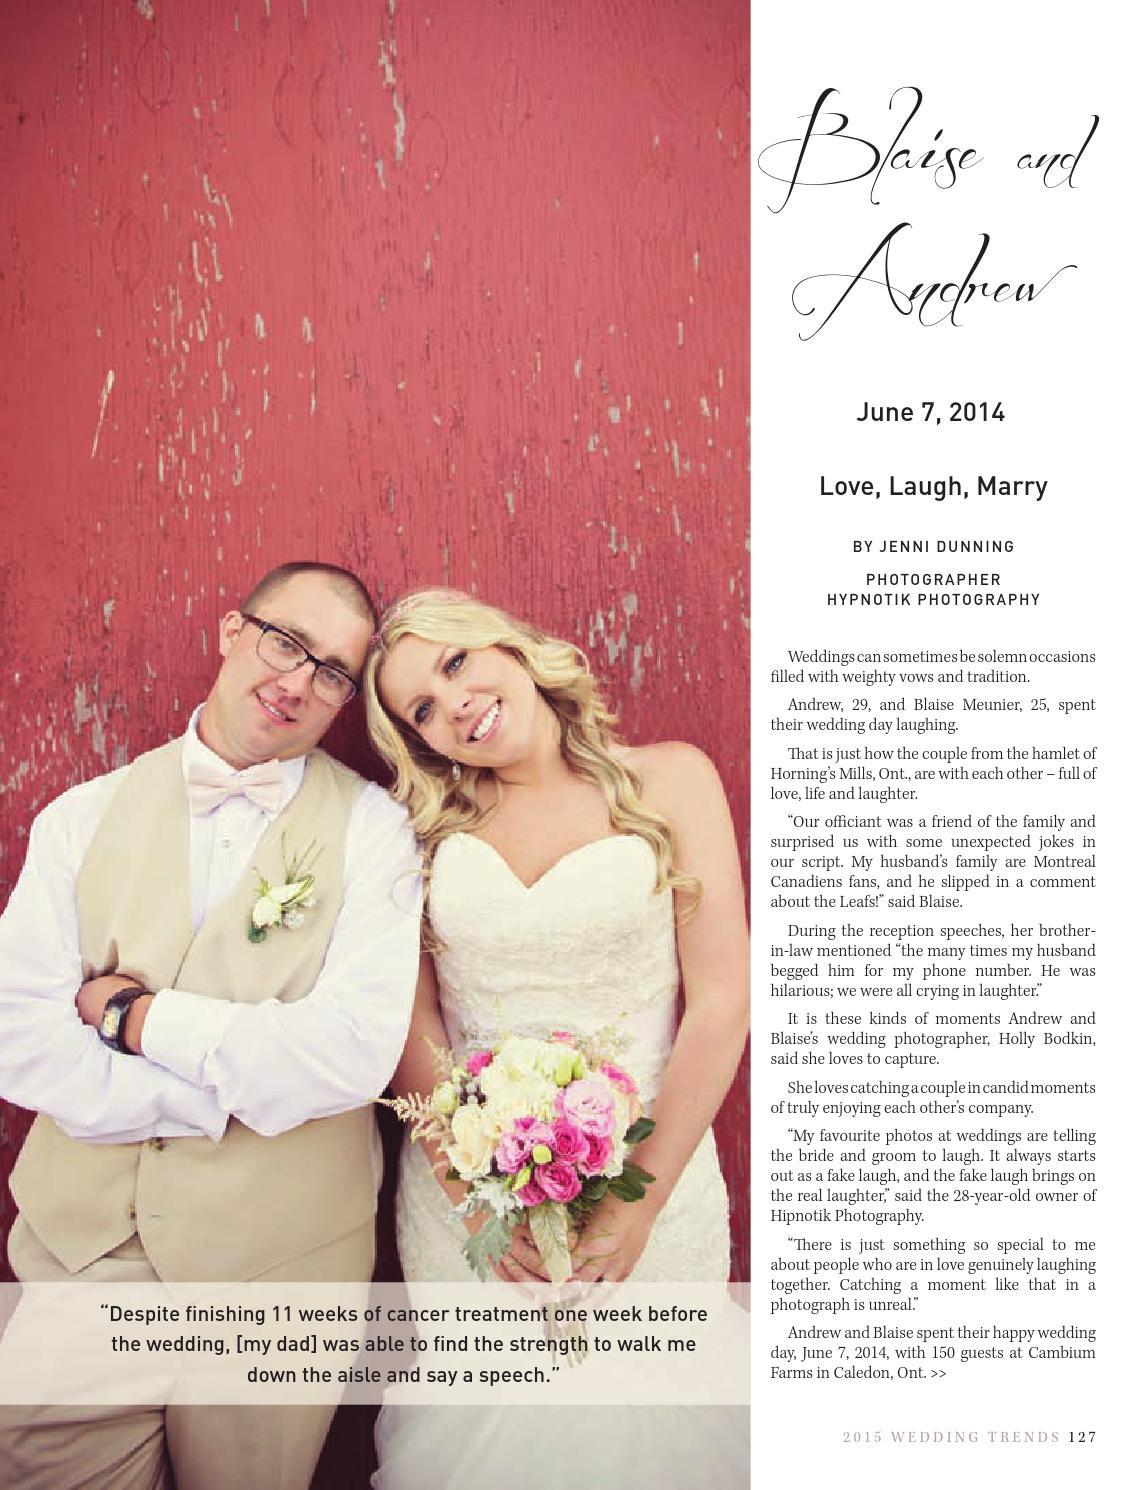 Wedding Trends 2015 by GoodLife Magazine - Simcoe County - issuu